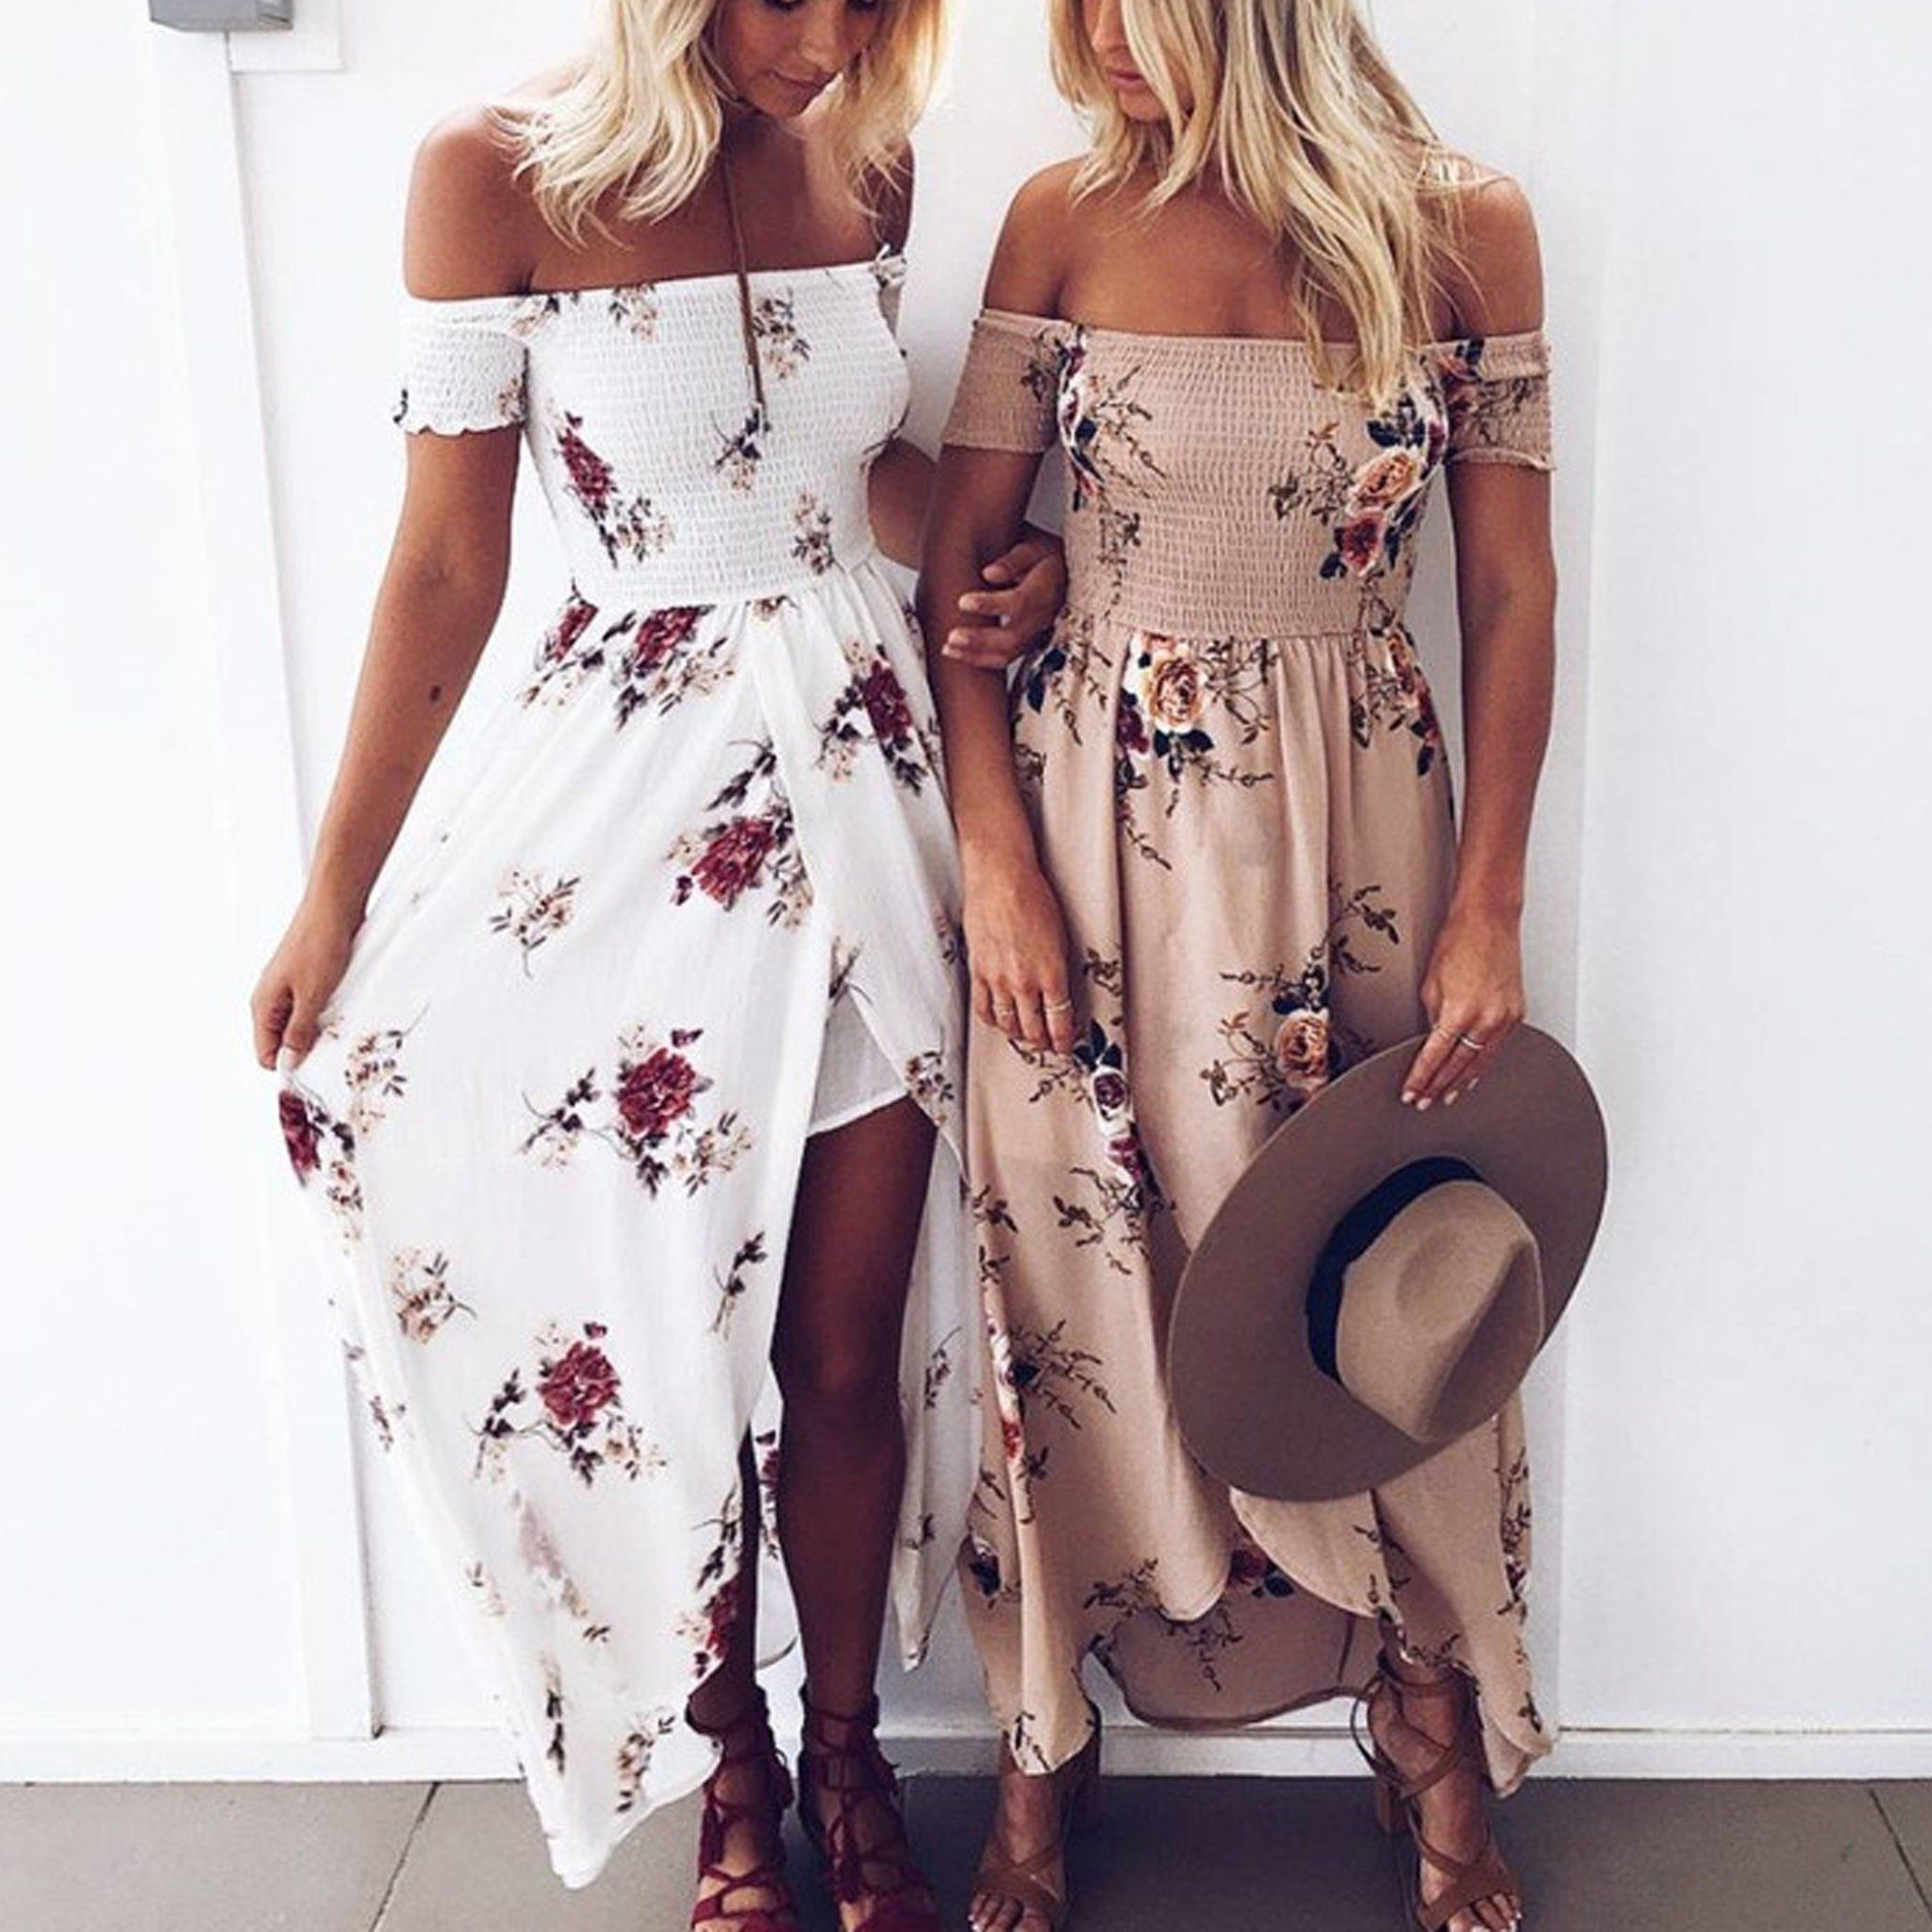 Boho Fashion Summer Beach Outfit Ideas for Women Casual